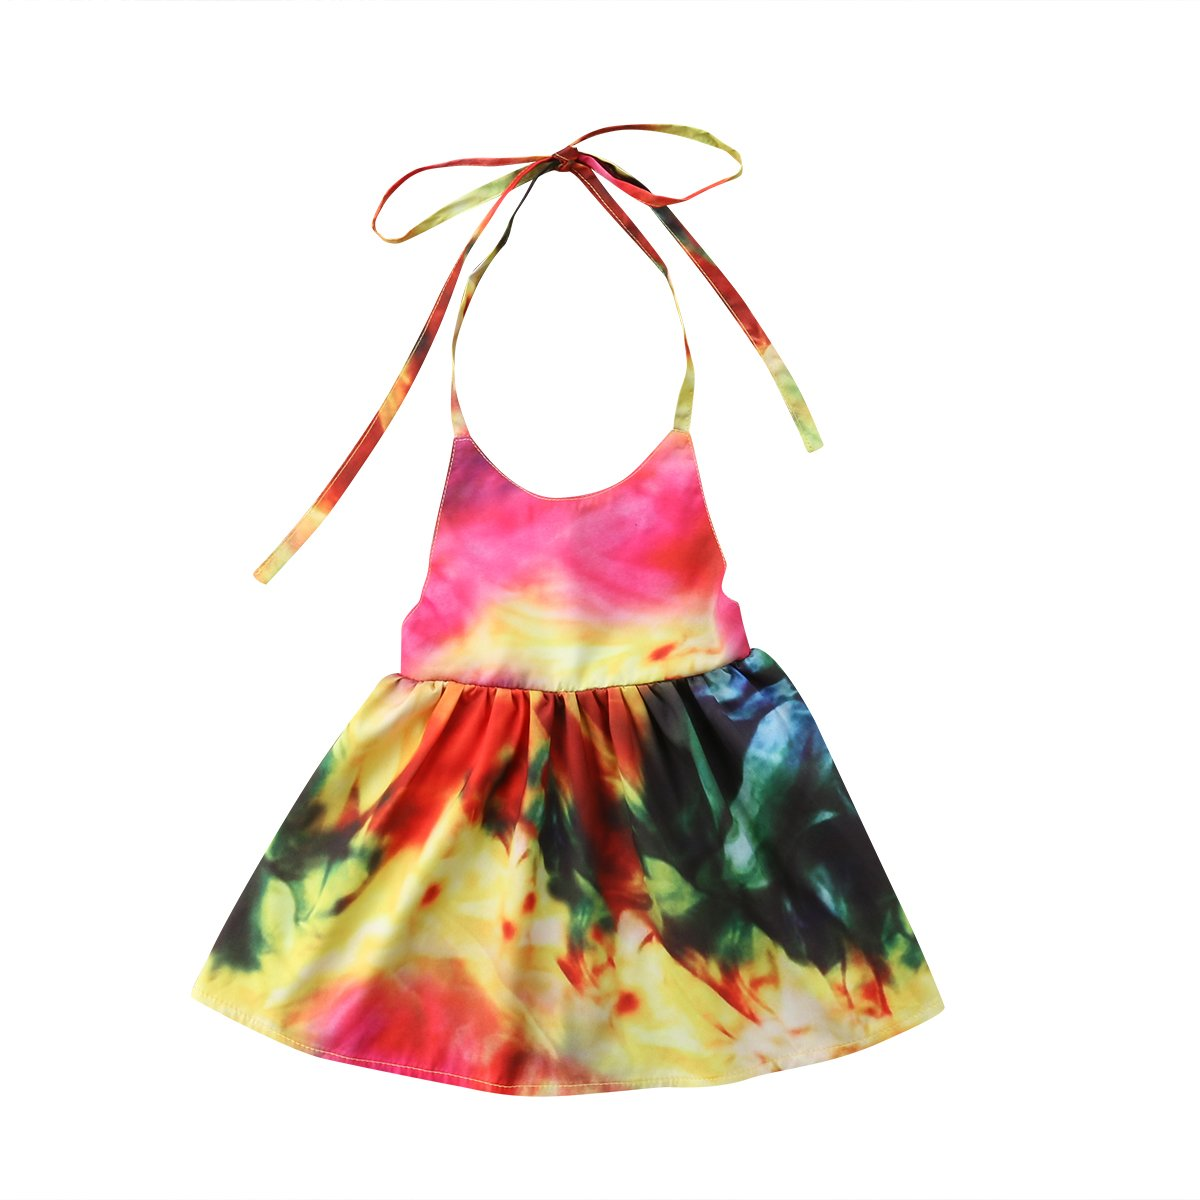 Mubineo Toddler Girl Baby Kids Colorful Summer Halter Fashion Backless Dress Sundress